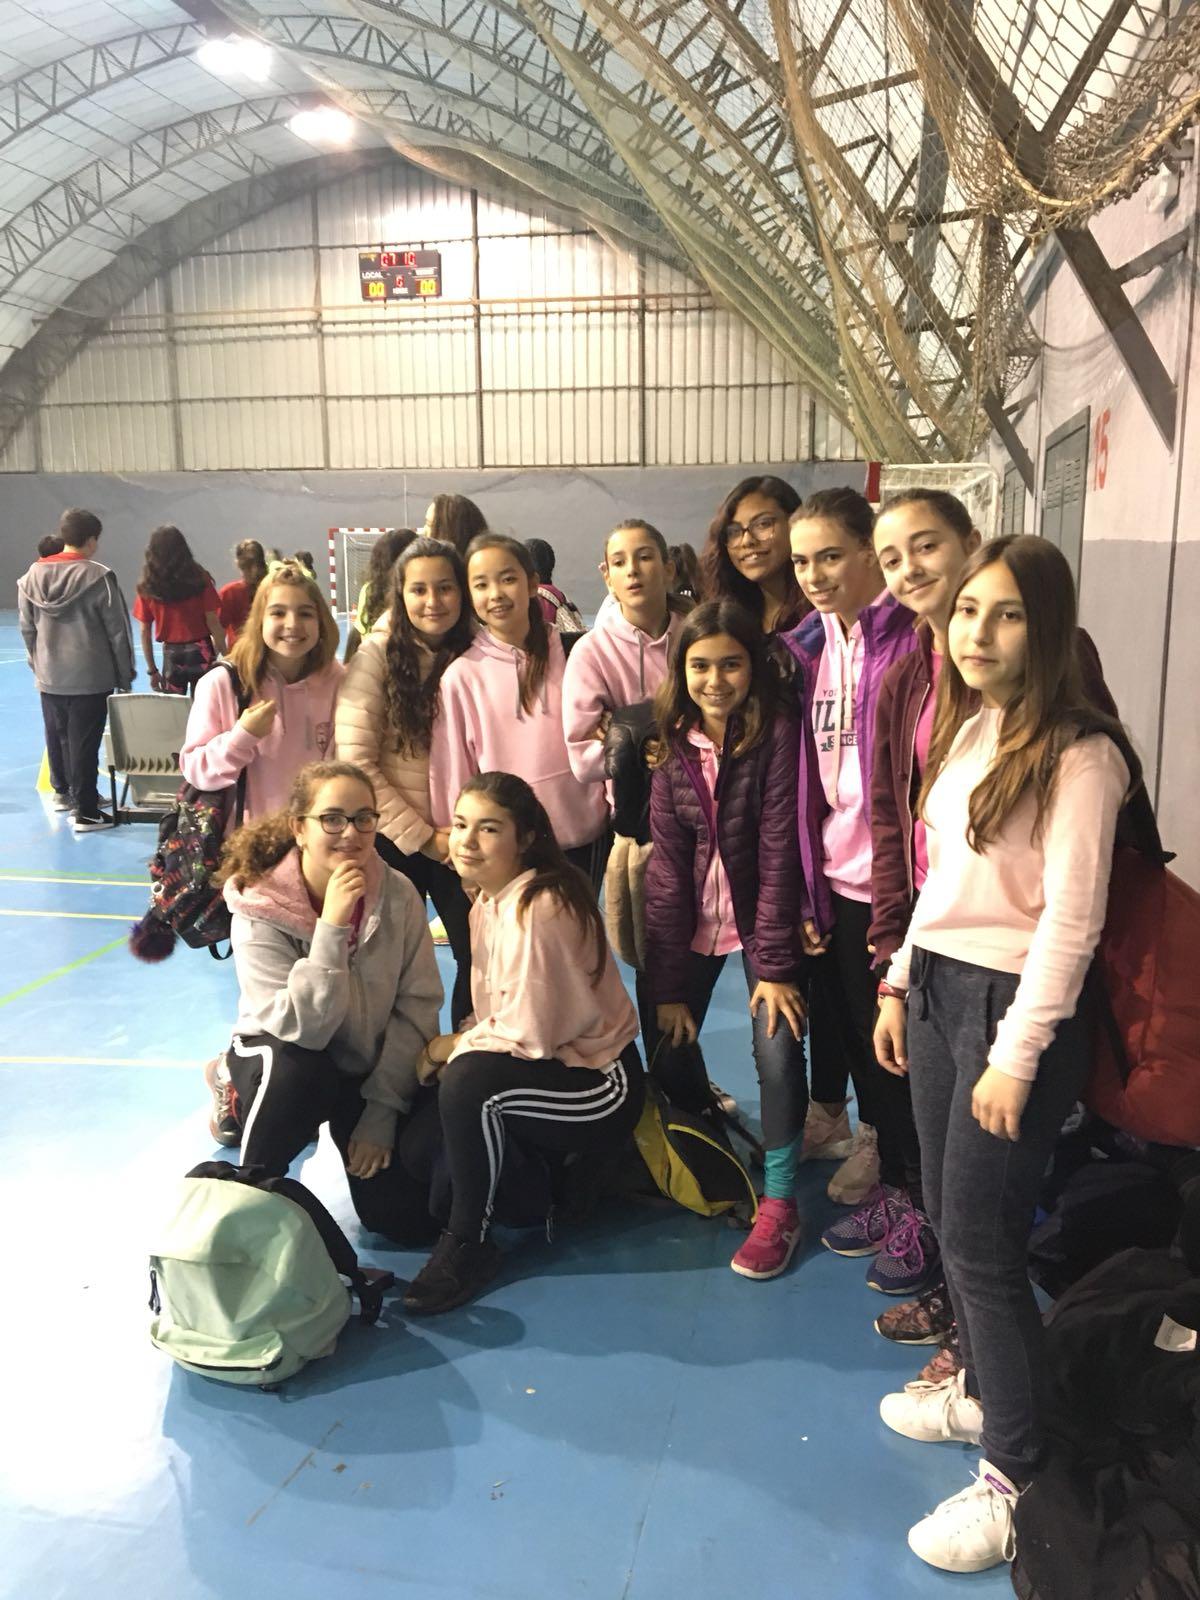 jornades esportives 1eso 2018-2